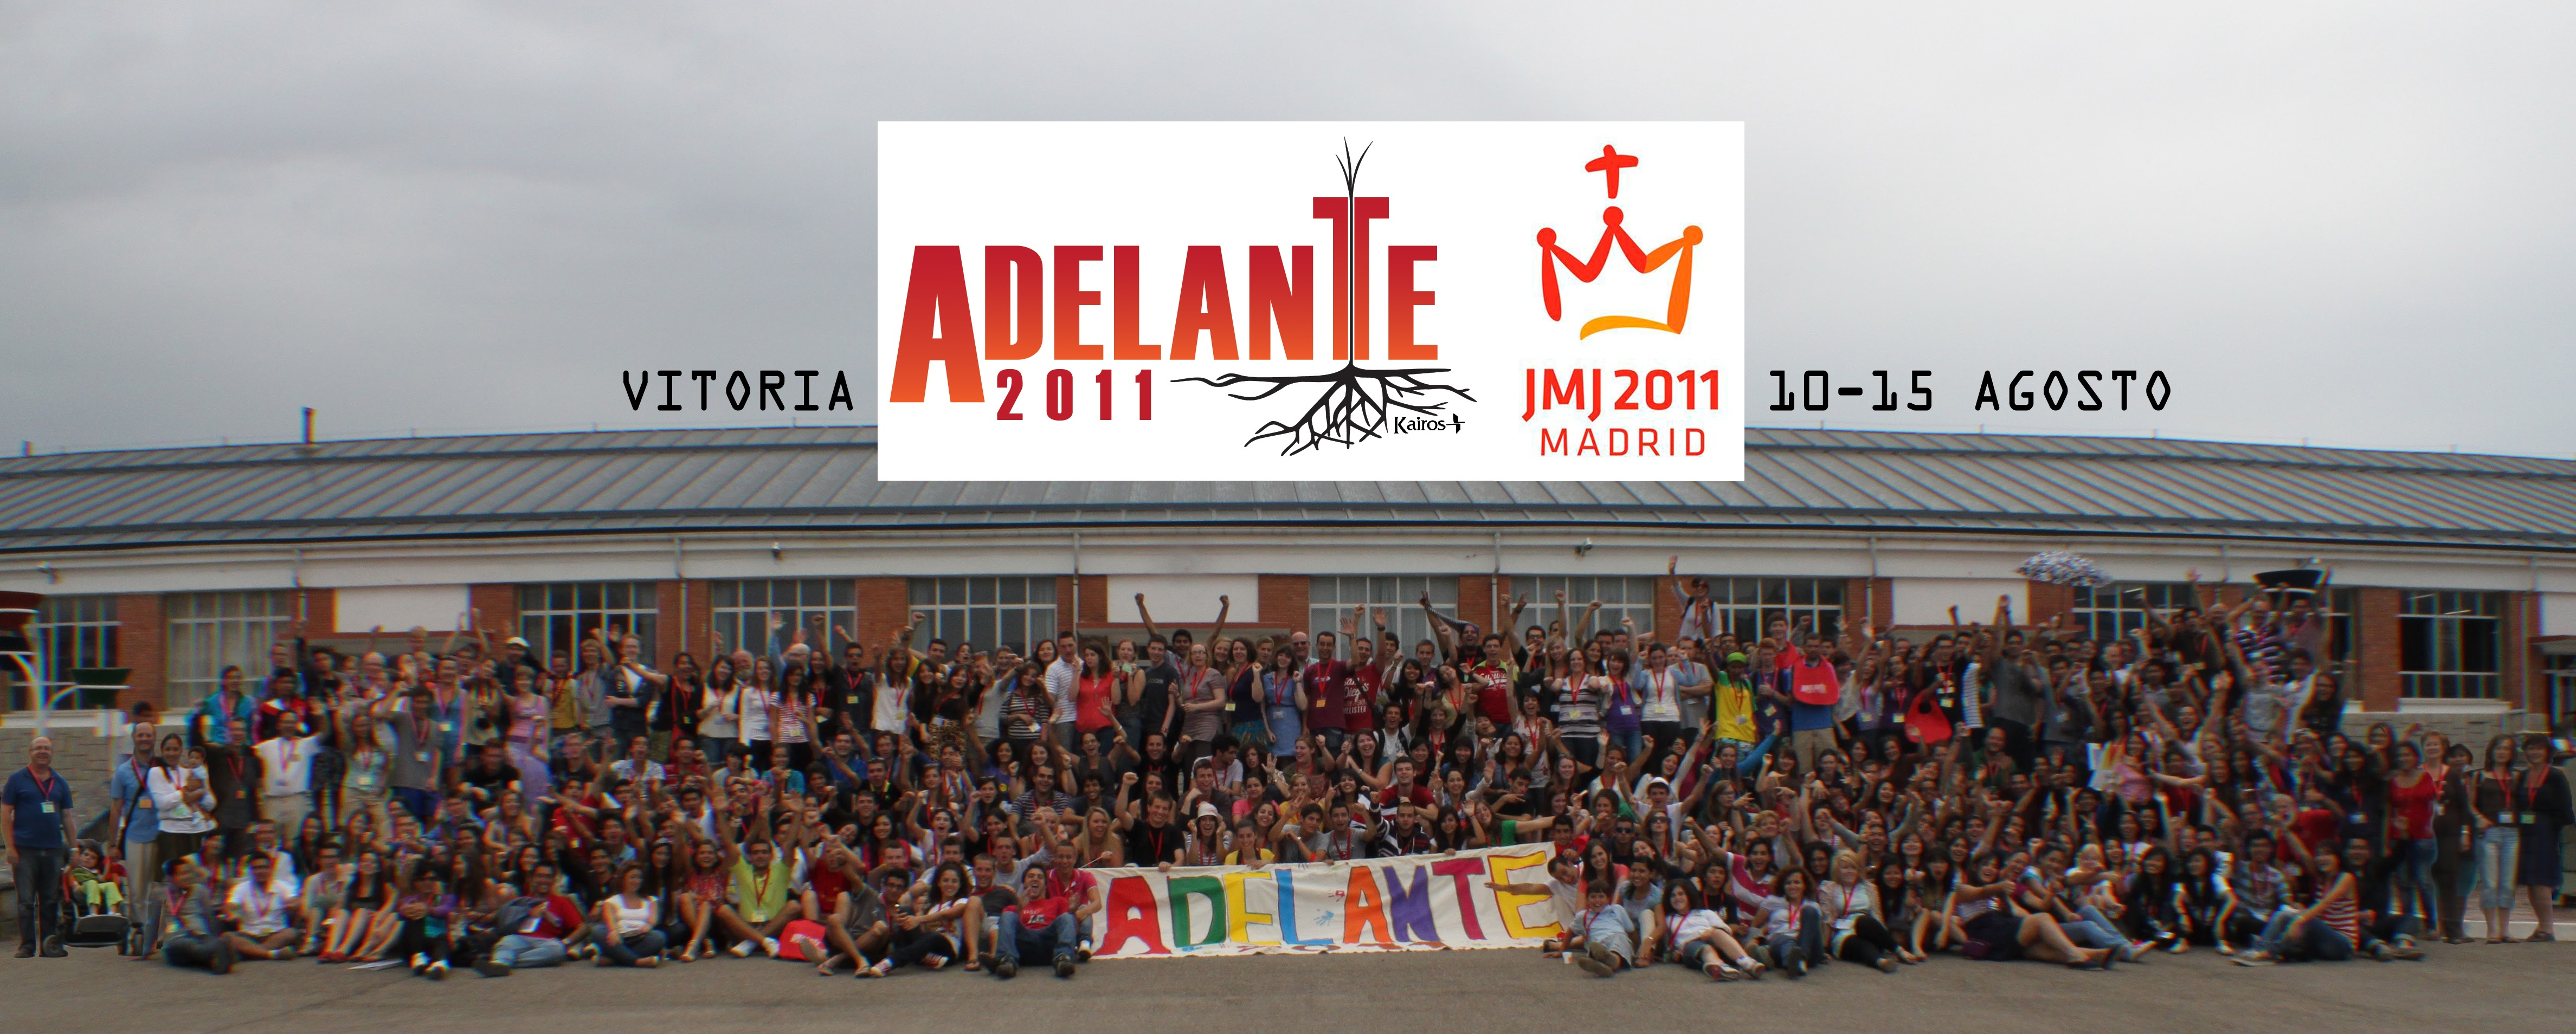 Picasa - Adelante 2011(0)General.jpg